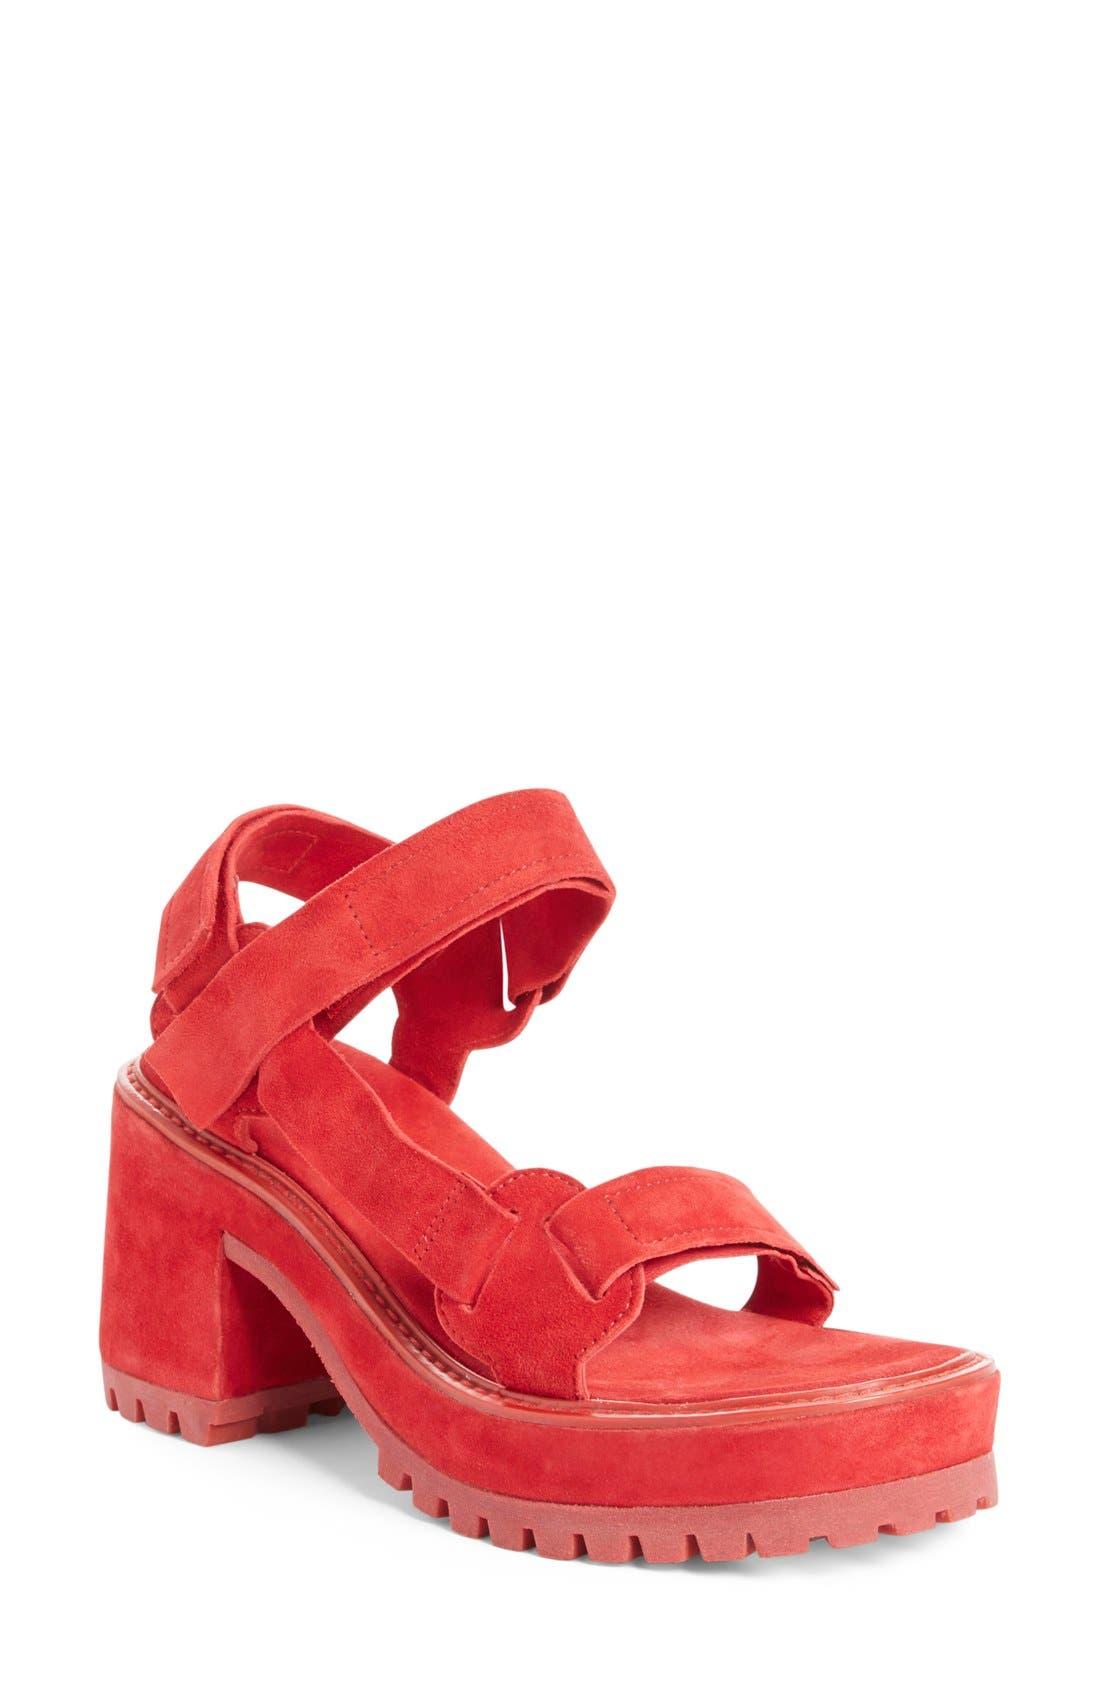 Alternate Image 1 Selected - Marques'Almeida Chunky Heel Sandal (Women)